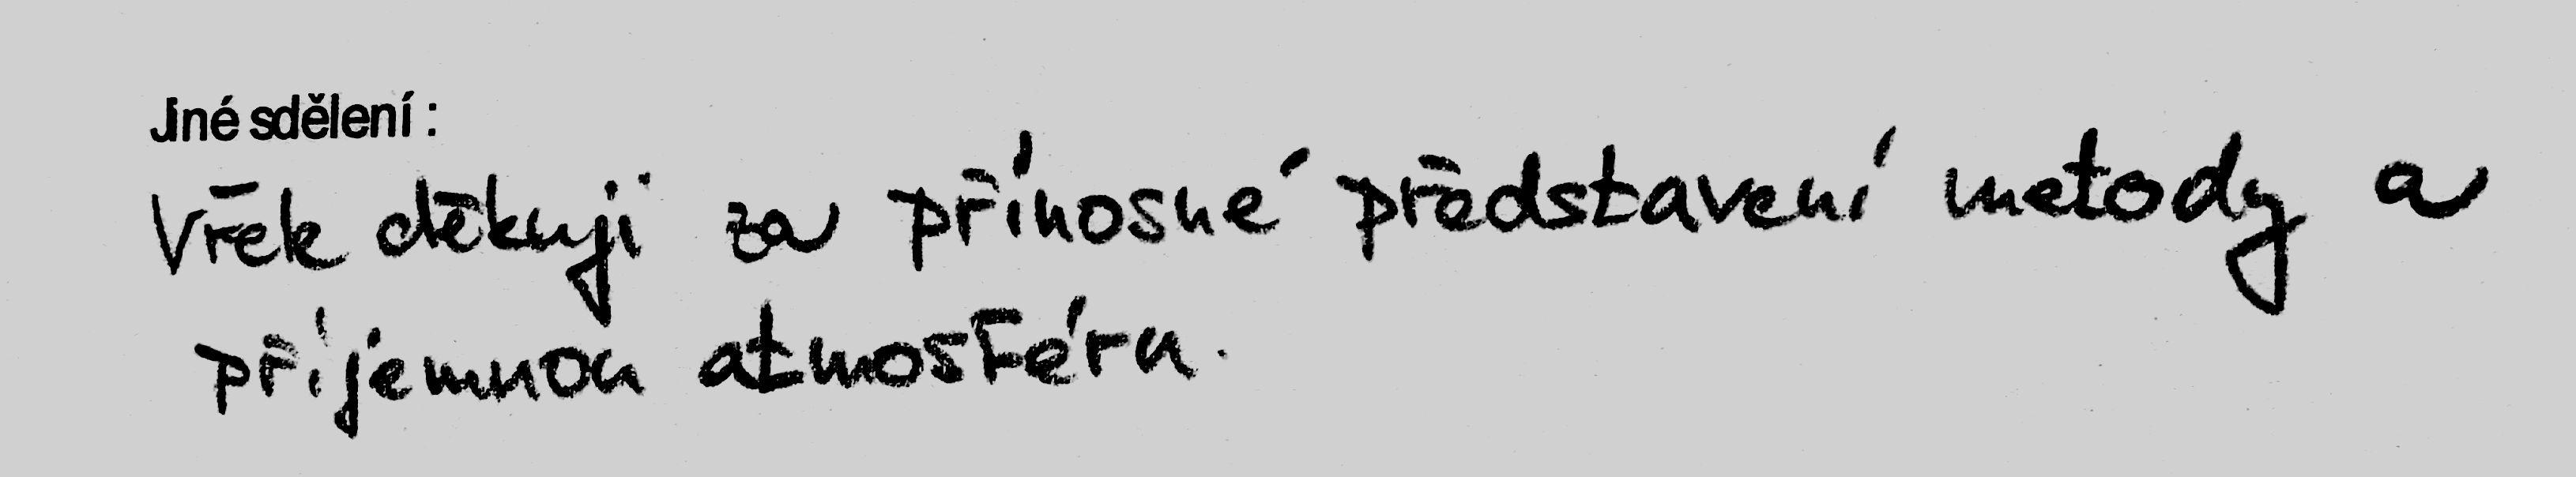 fdb (19)